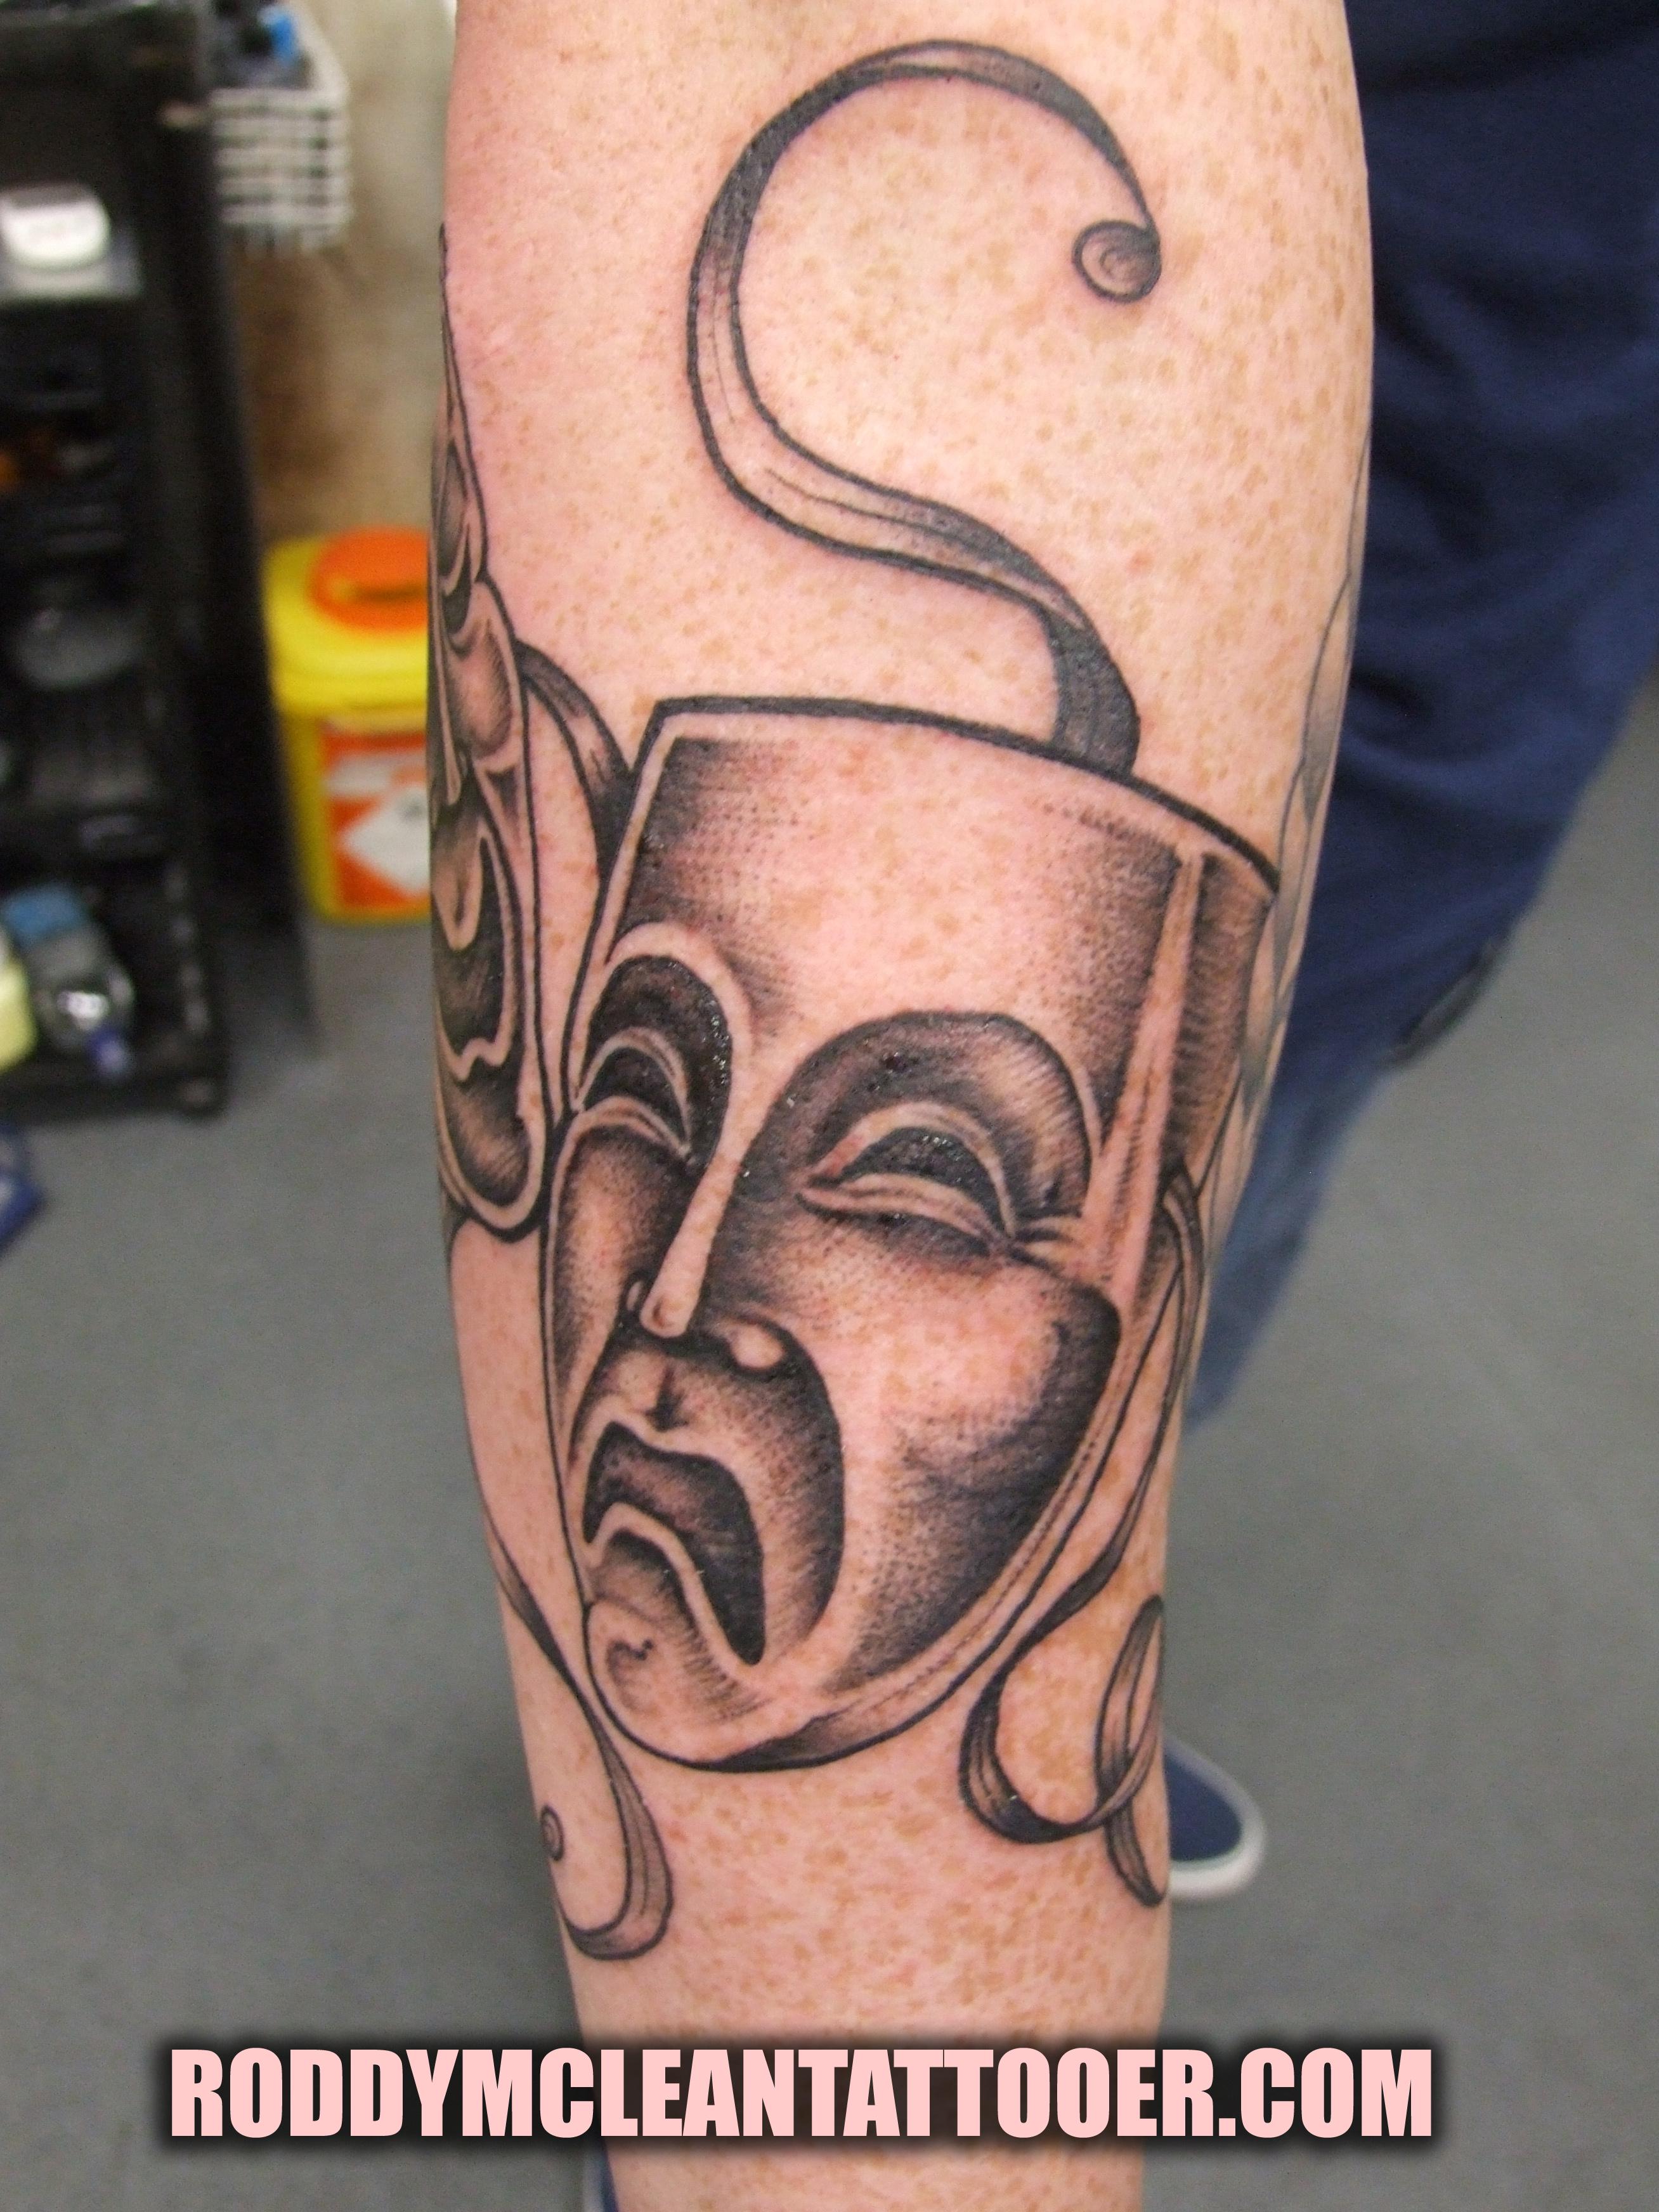 Happy and sad face masks happy and sad face tattoos - Image Image